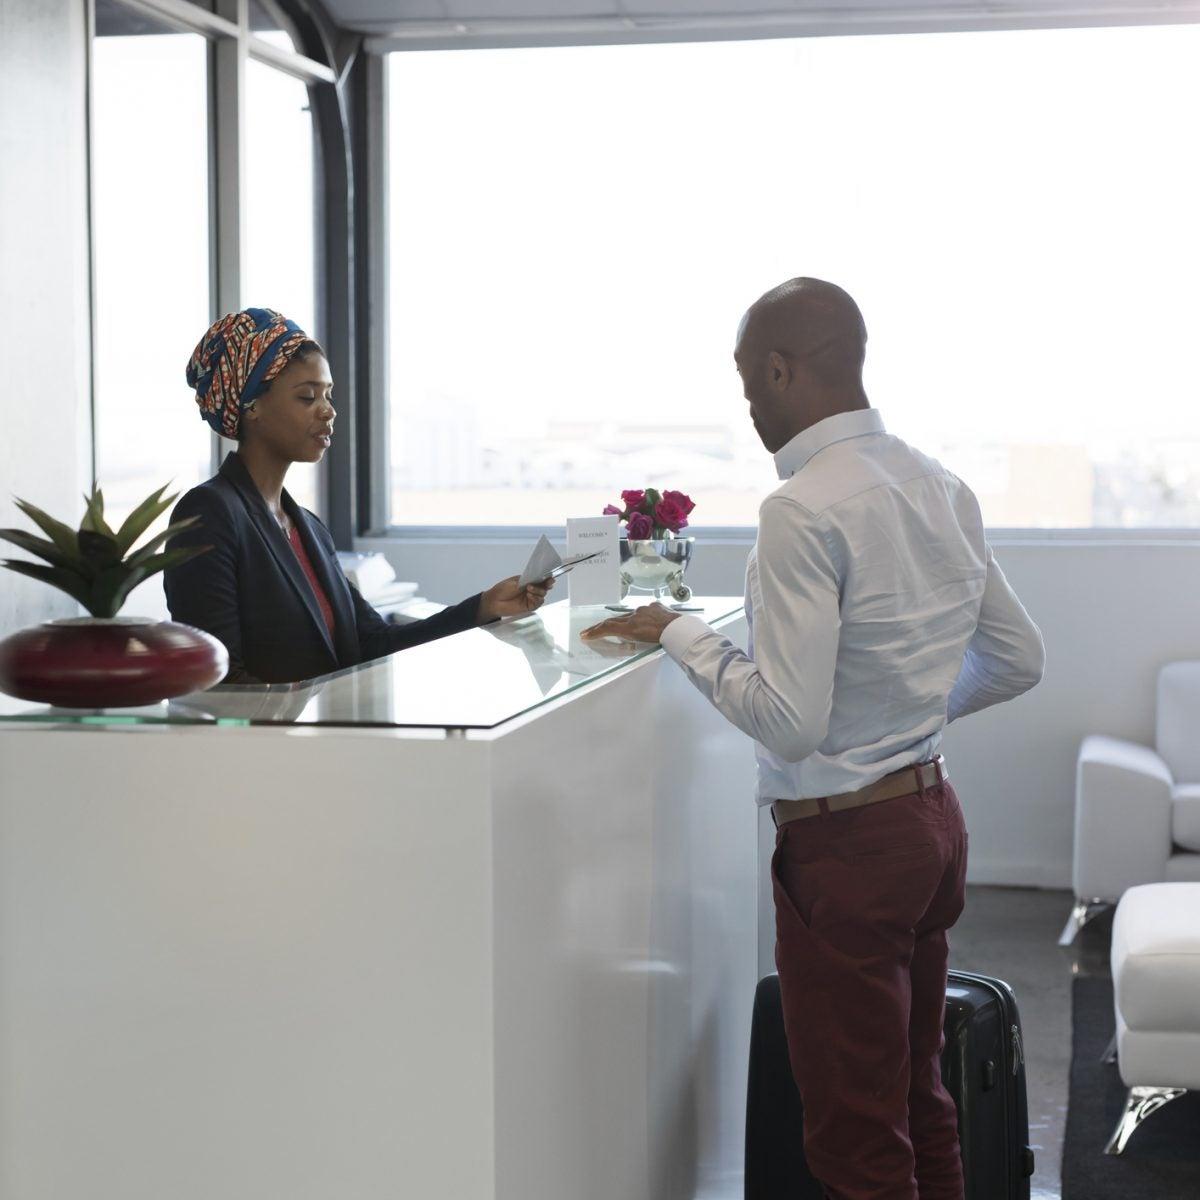 Hotel Bookings Are Still At A Record High Despite Delta Variant Concerns